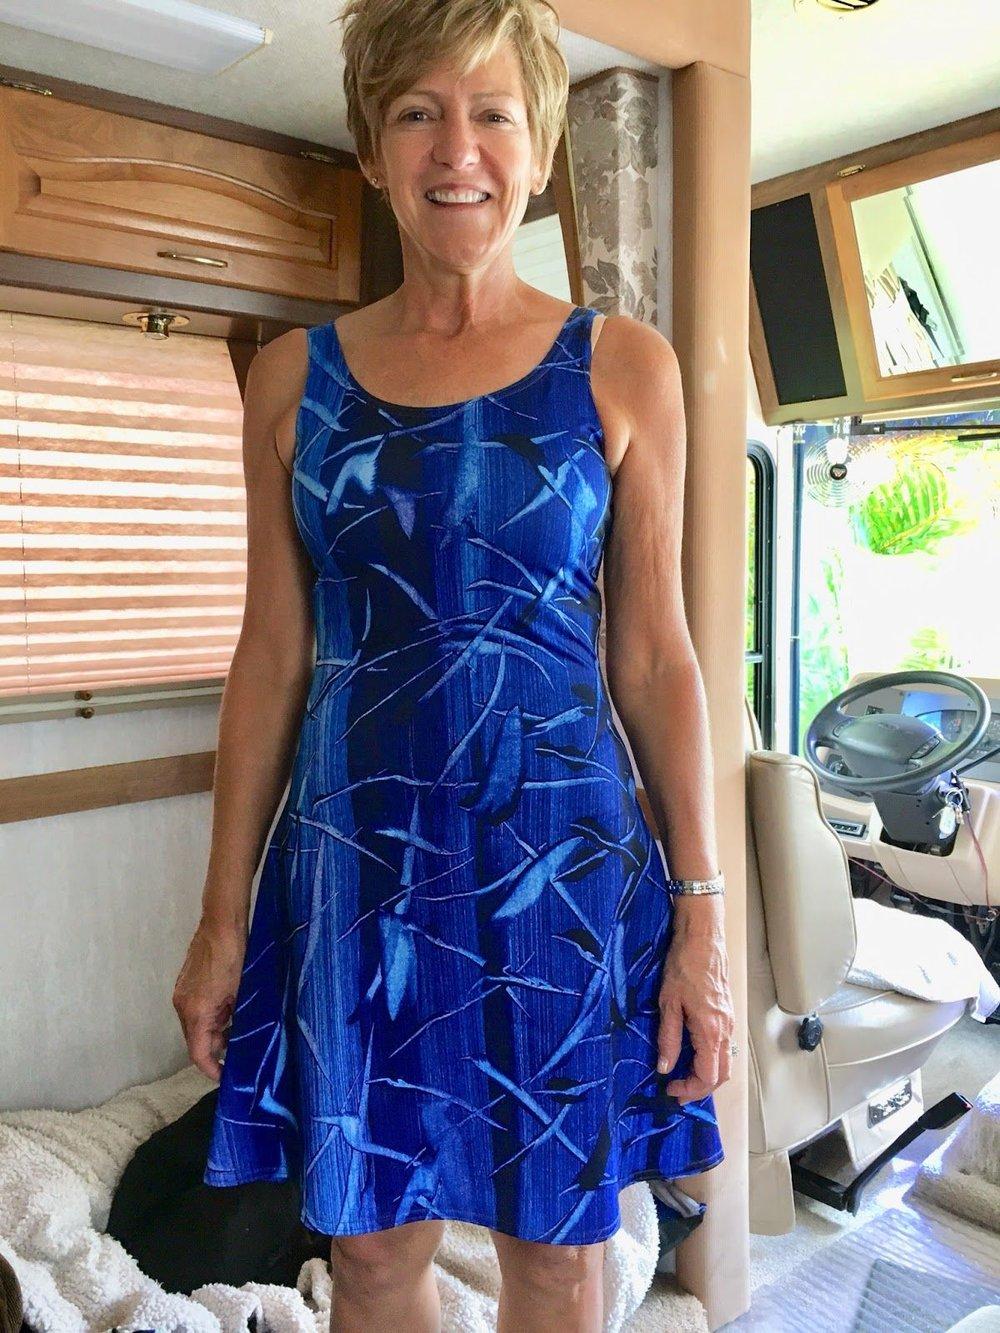 Flight flare dress ready for RV travel